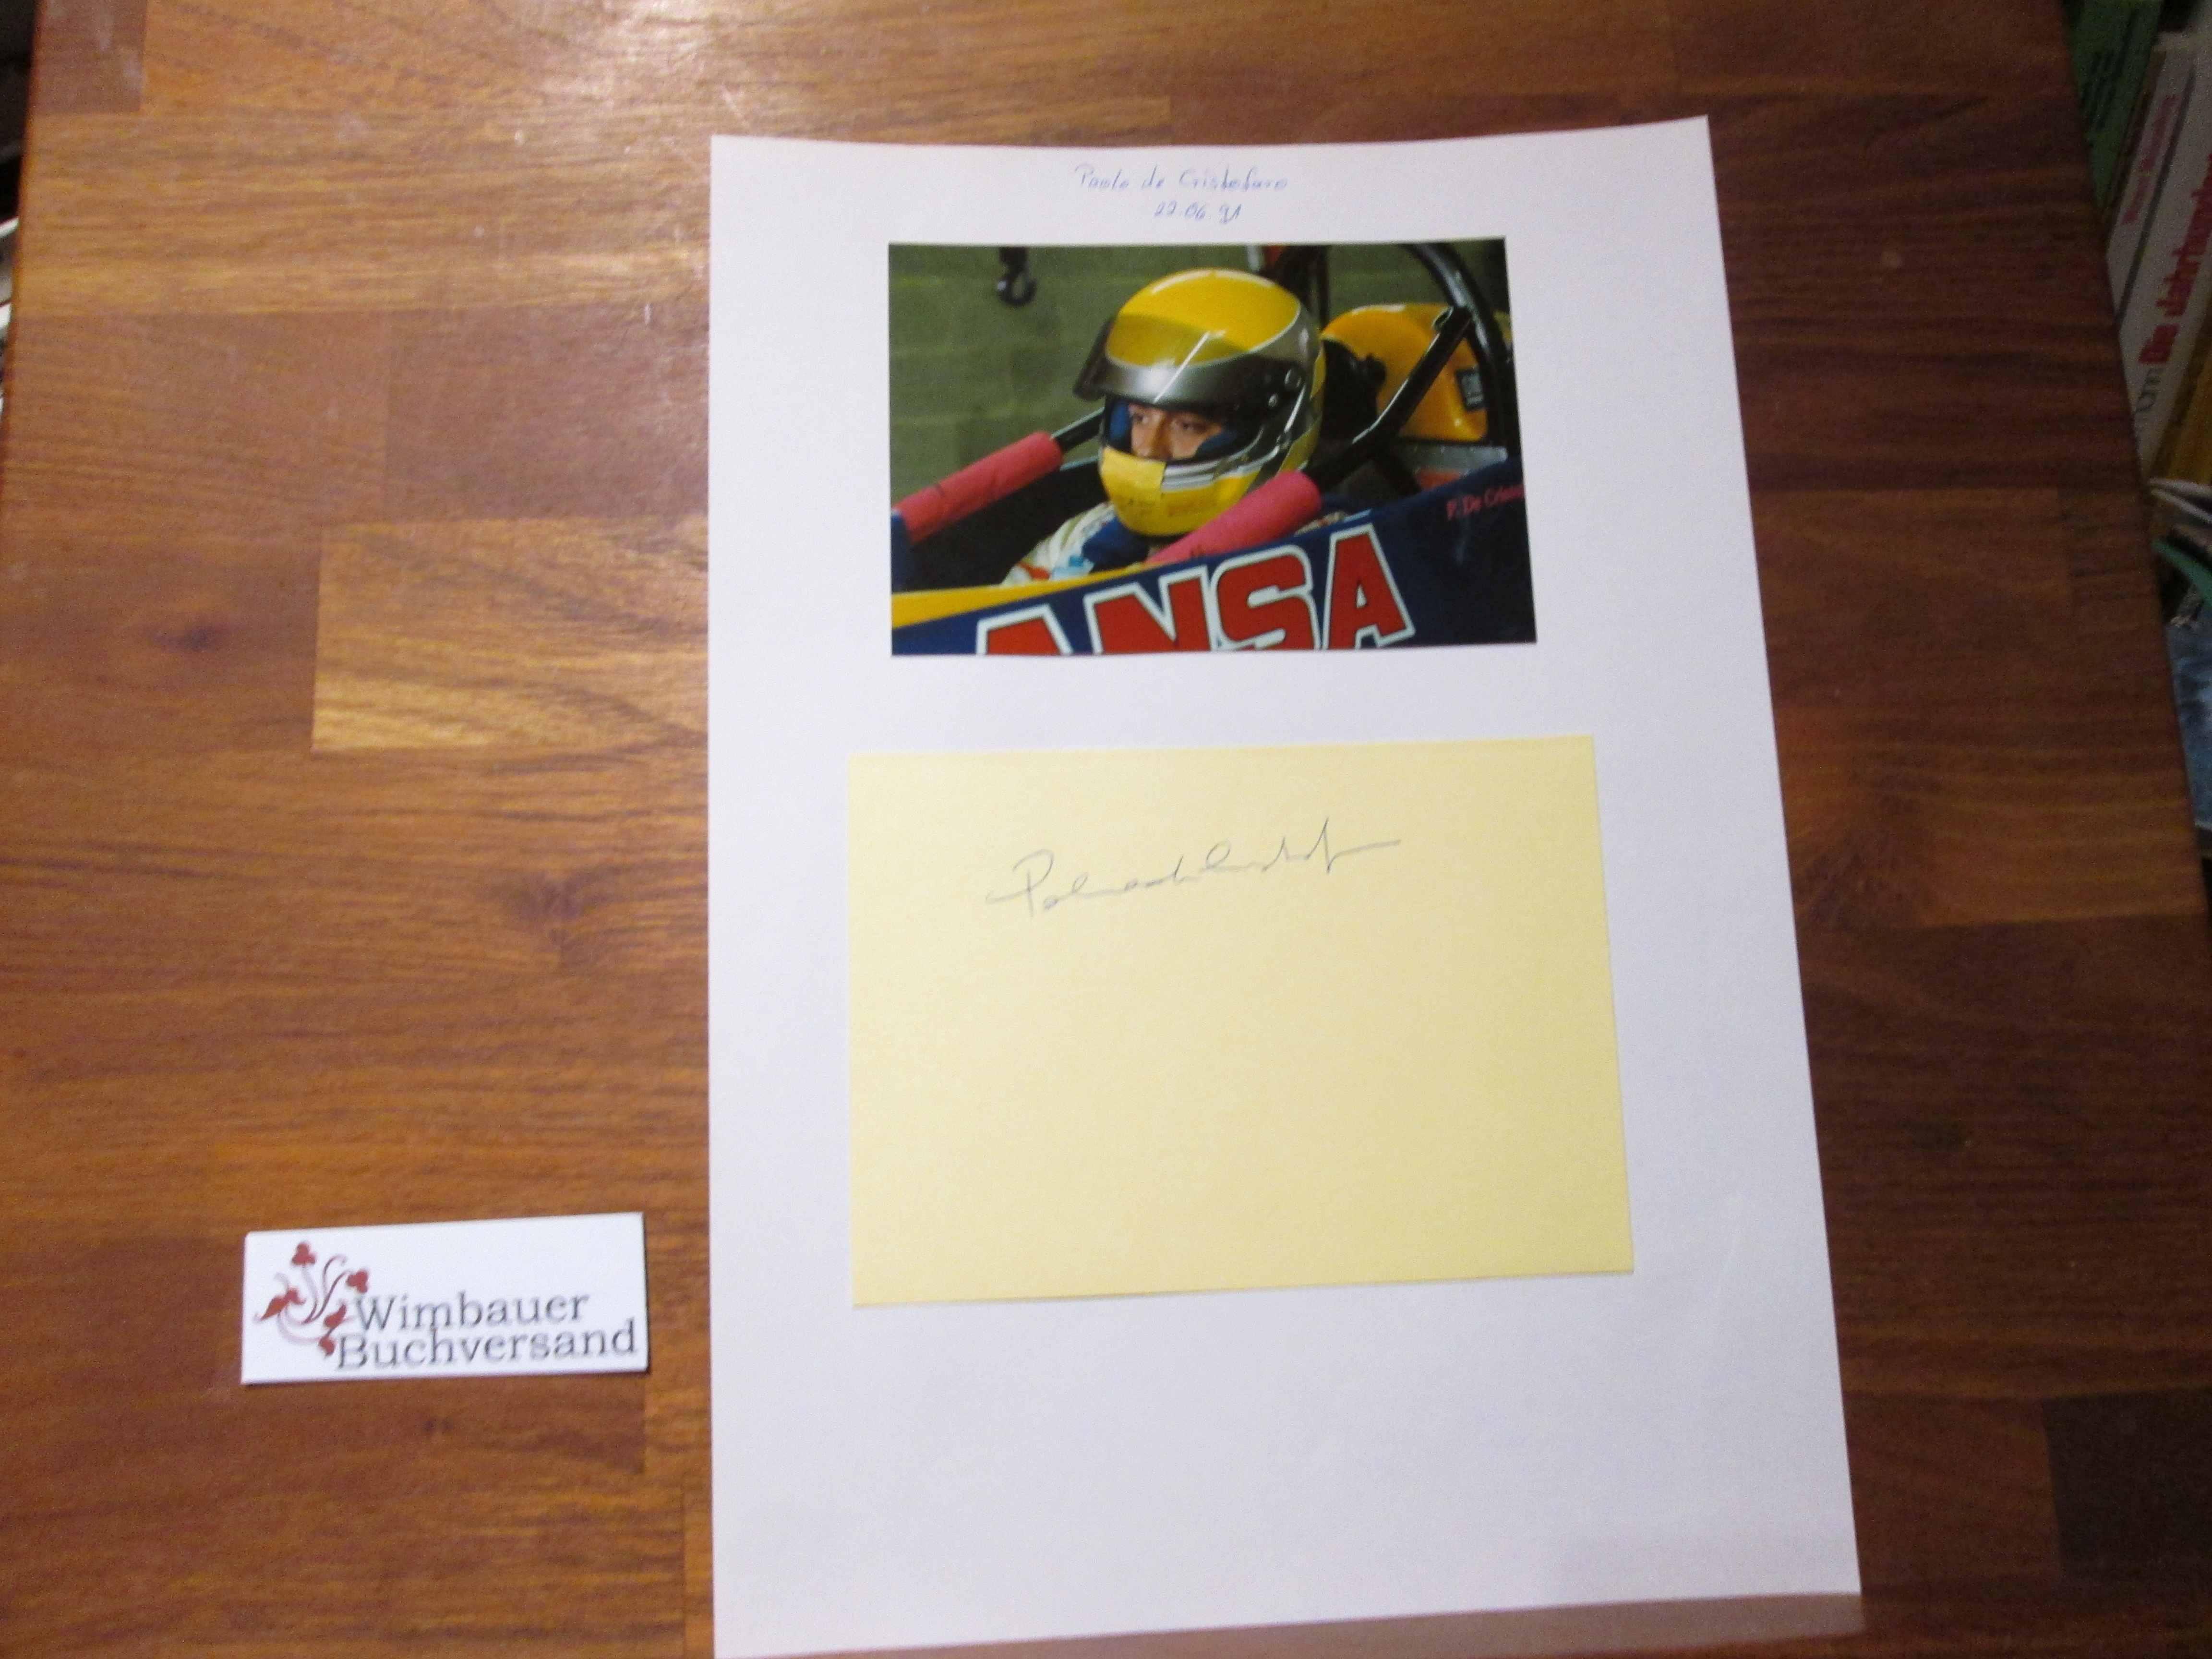 Cristofaro, Paolo de : Original Autogramm Paolo de Cristofaro racing Driver /// Autograph signiert signed signee